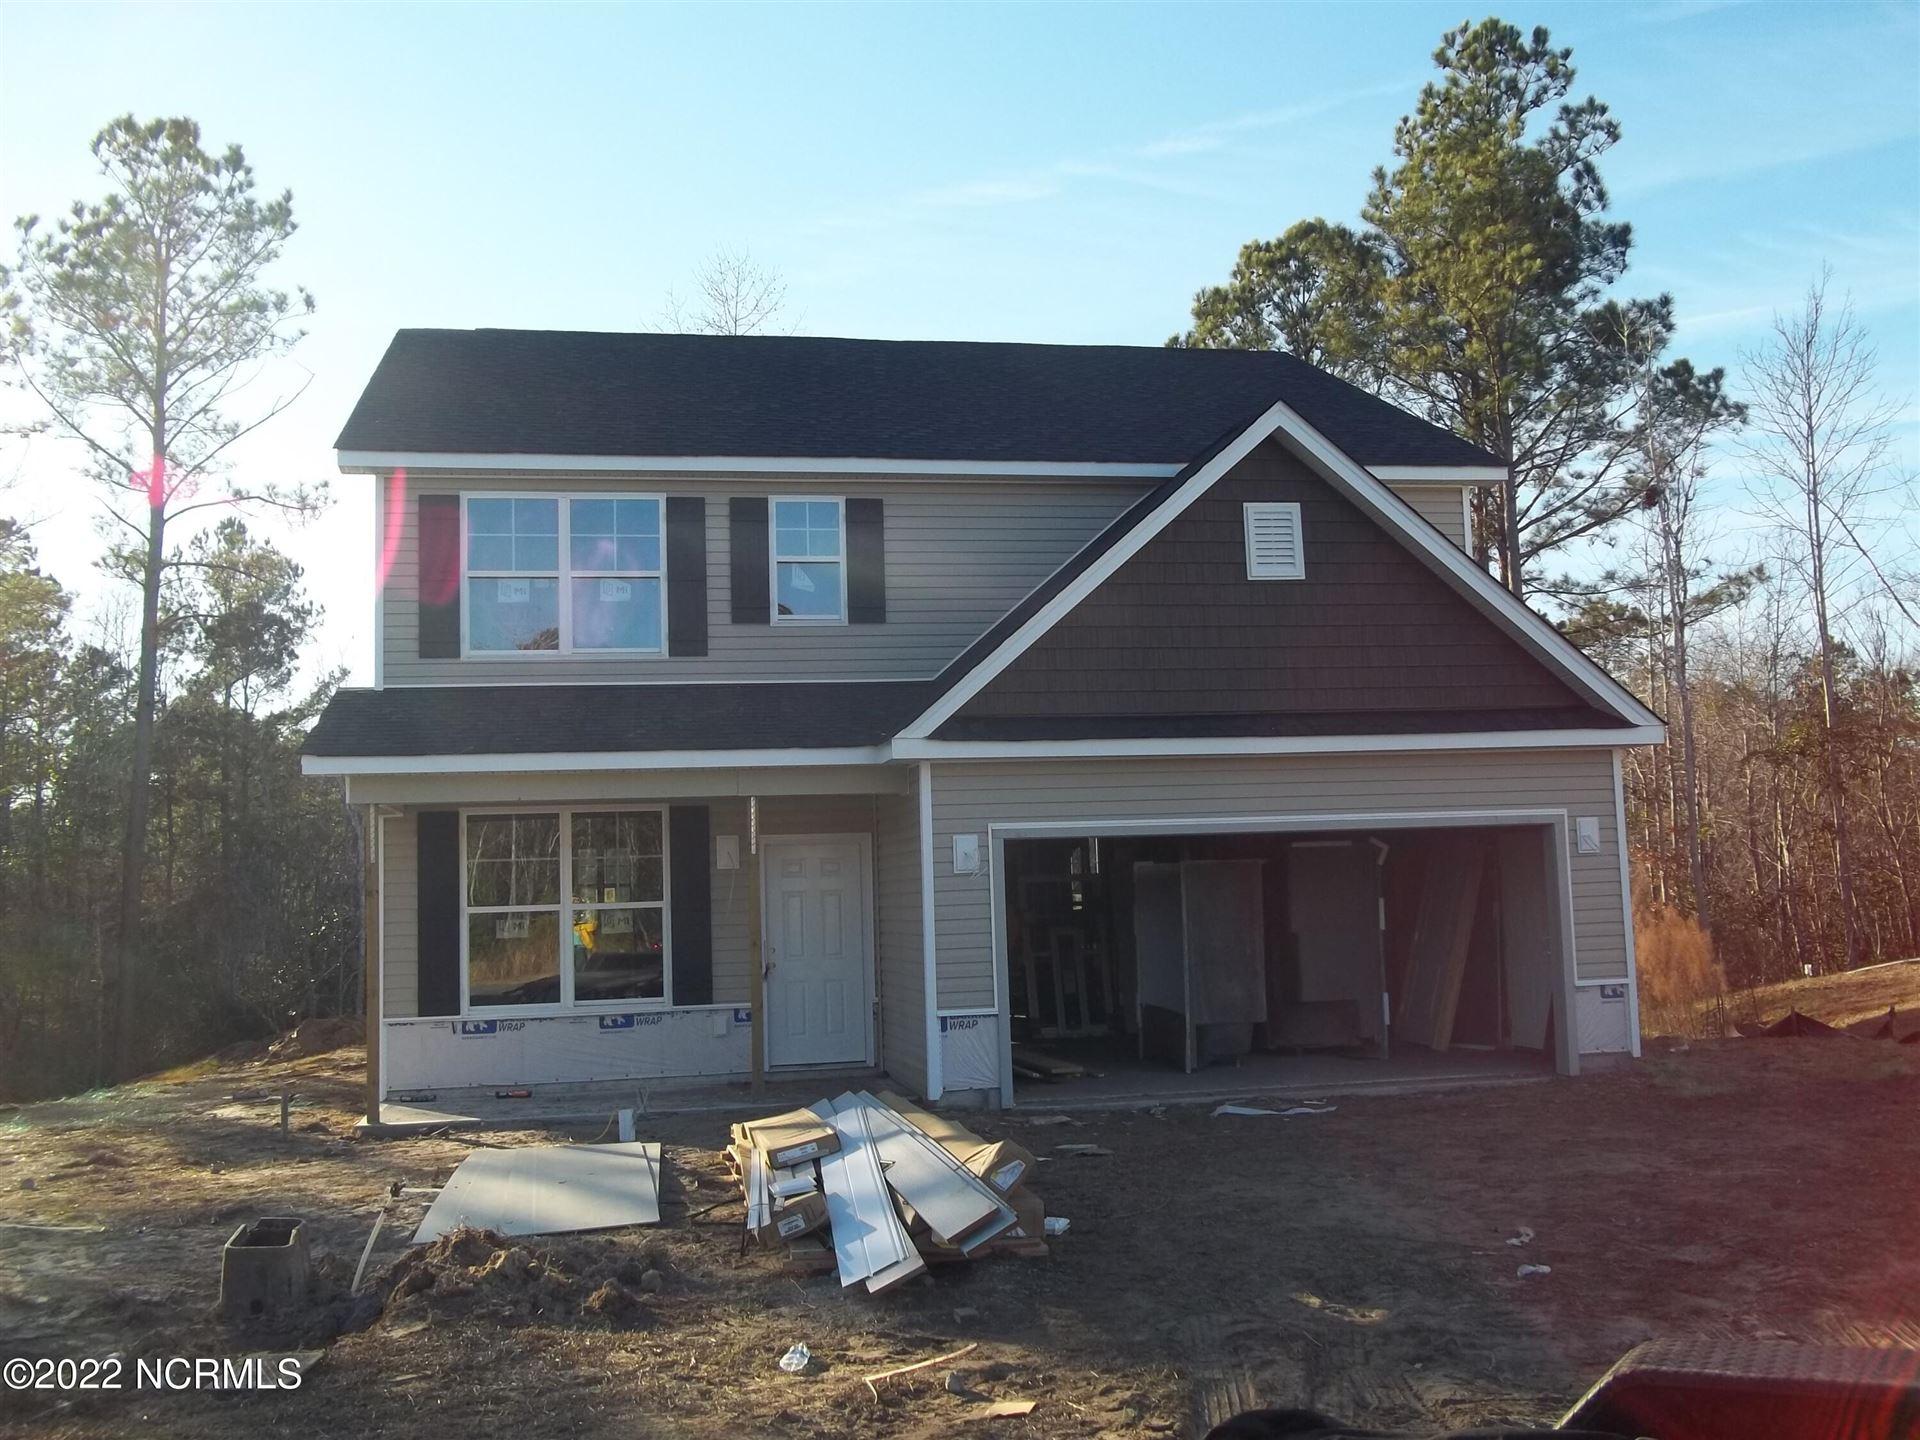 Photo of 923 W W Arboria Drive, Hampstead, NC 28443 (MLS # 100284585)